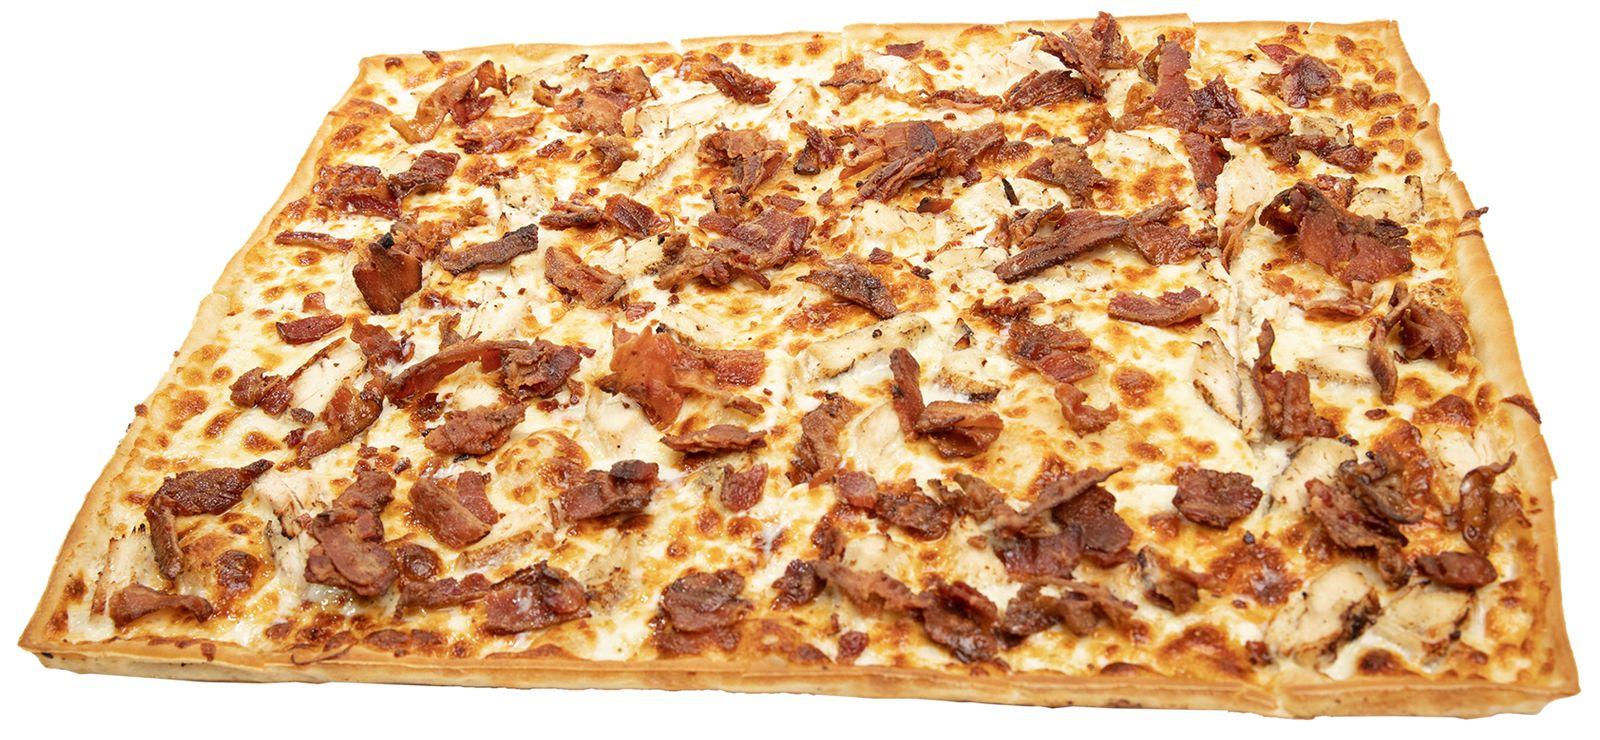 Say Aloha to Ledo Pizza's New Spring Menu Items